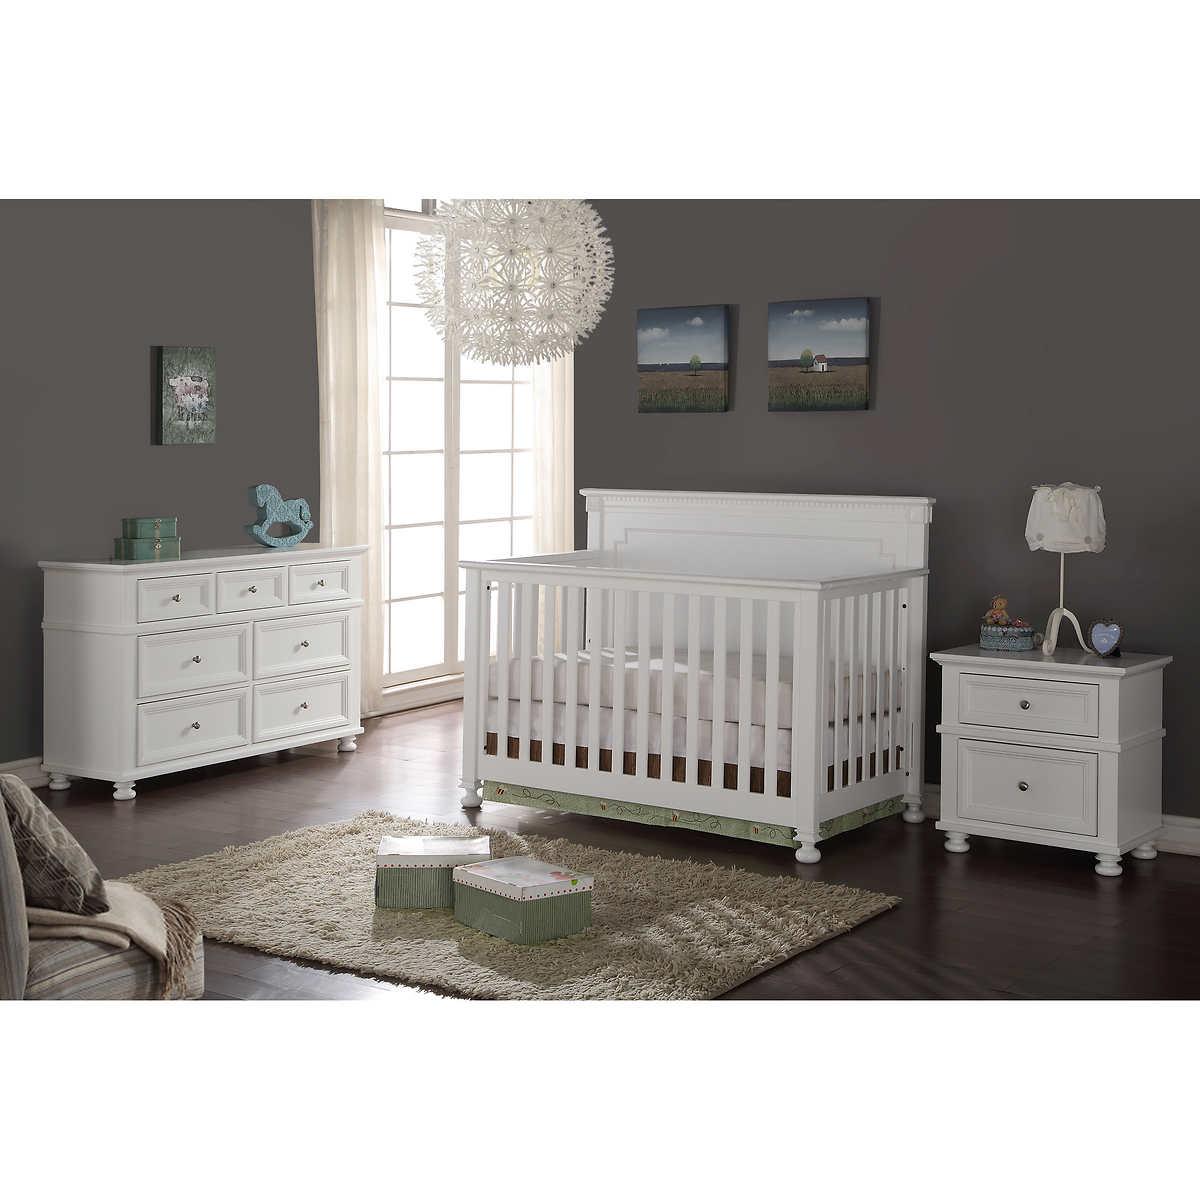 Caramia Kids Windsor 12-piece Nursery Furniture Set